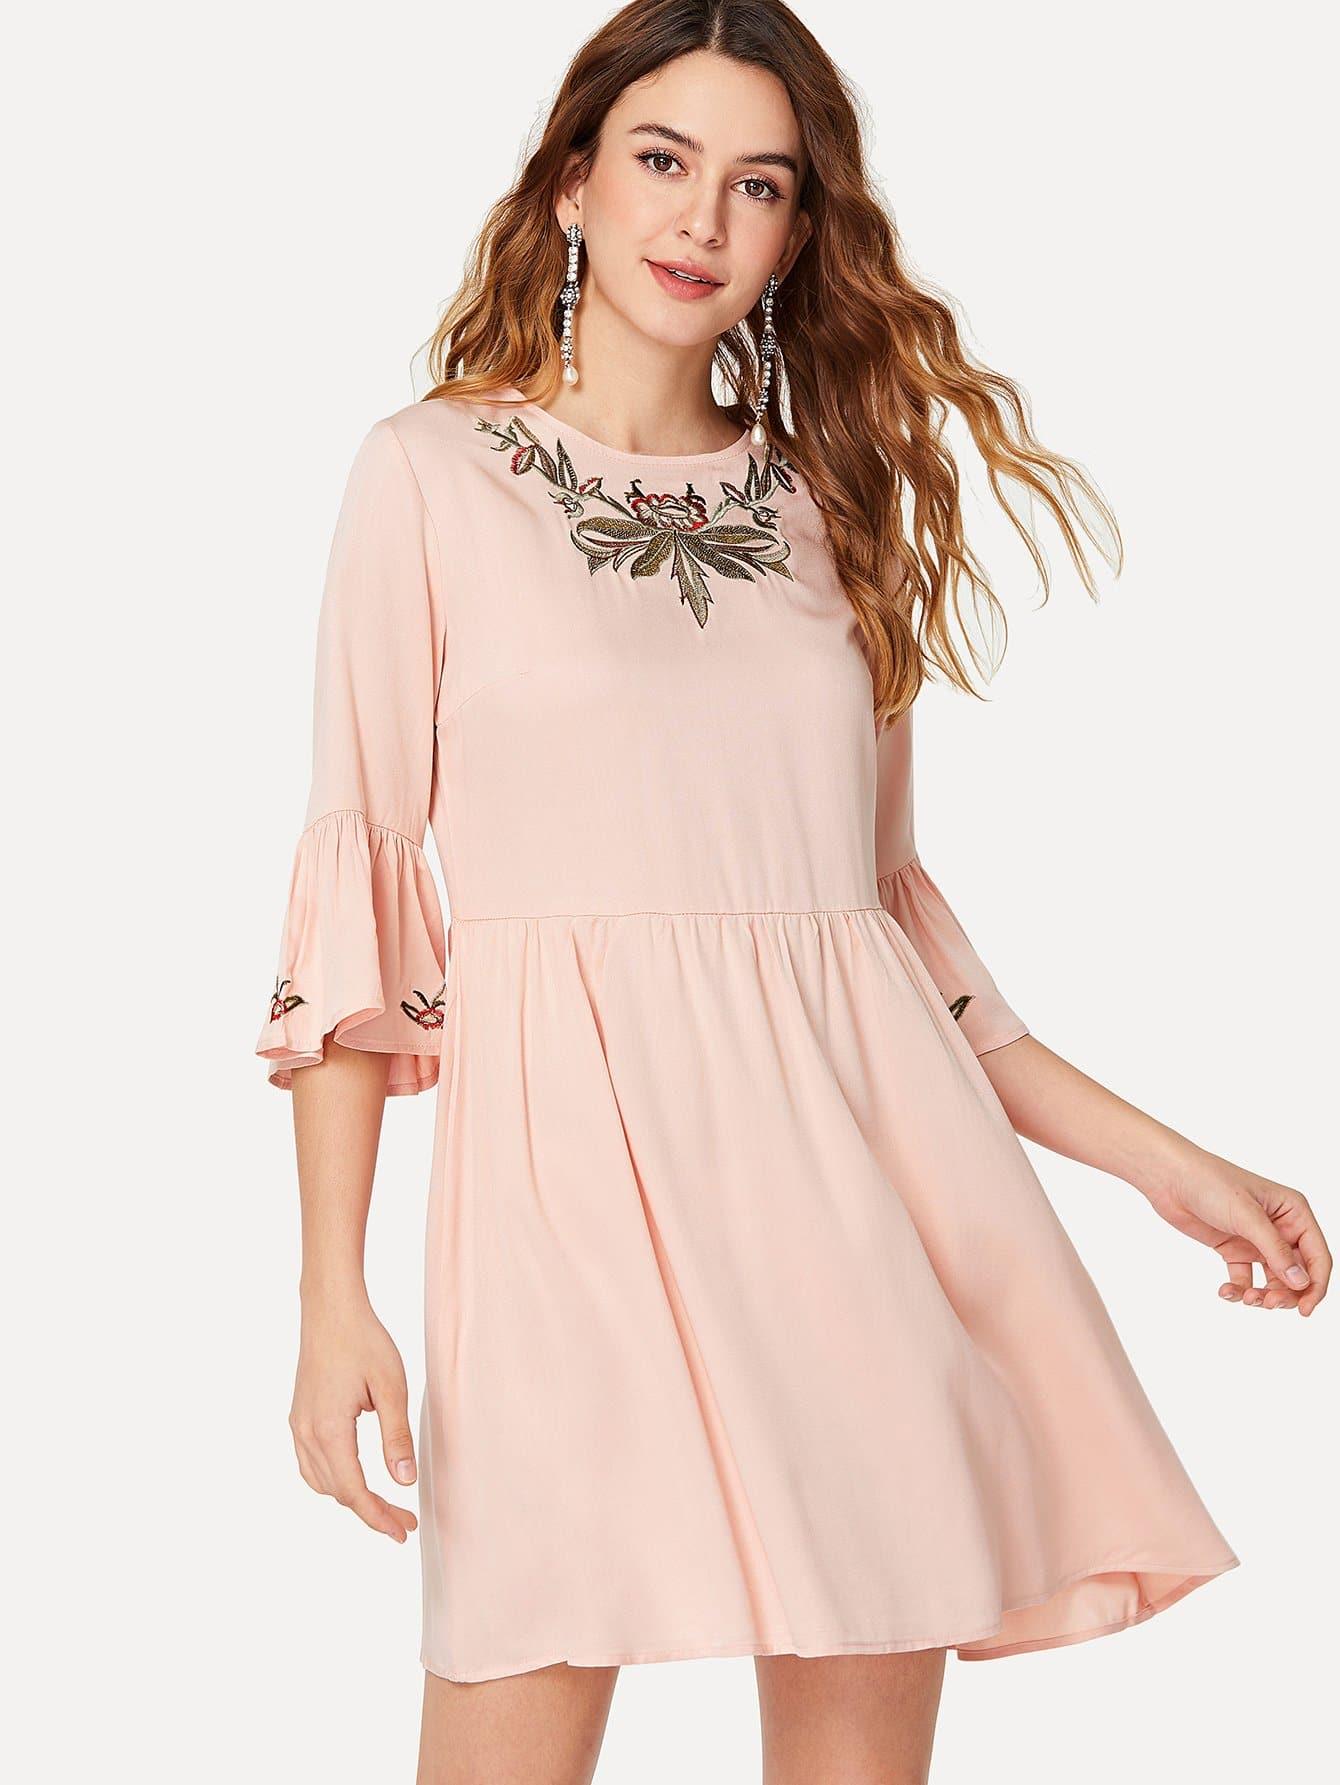 Ruffle Sleeve Flower Embroidery Smock Dress corduroy babydoll smock dress